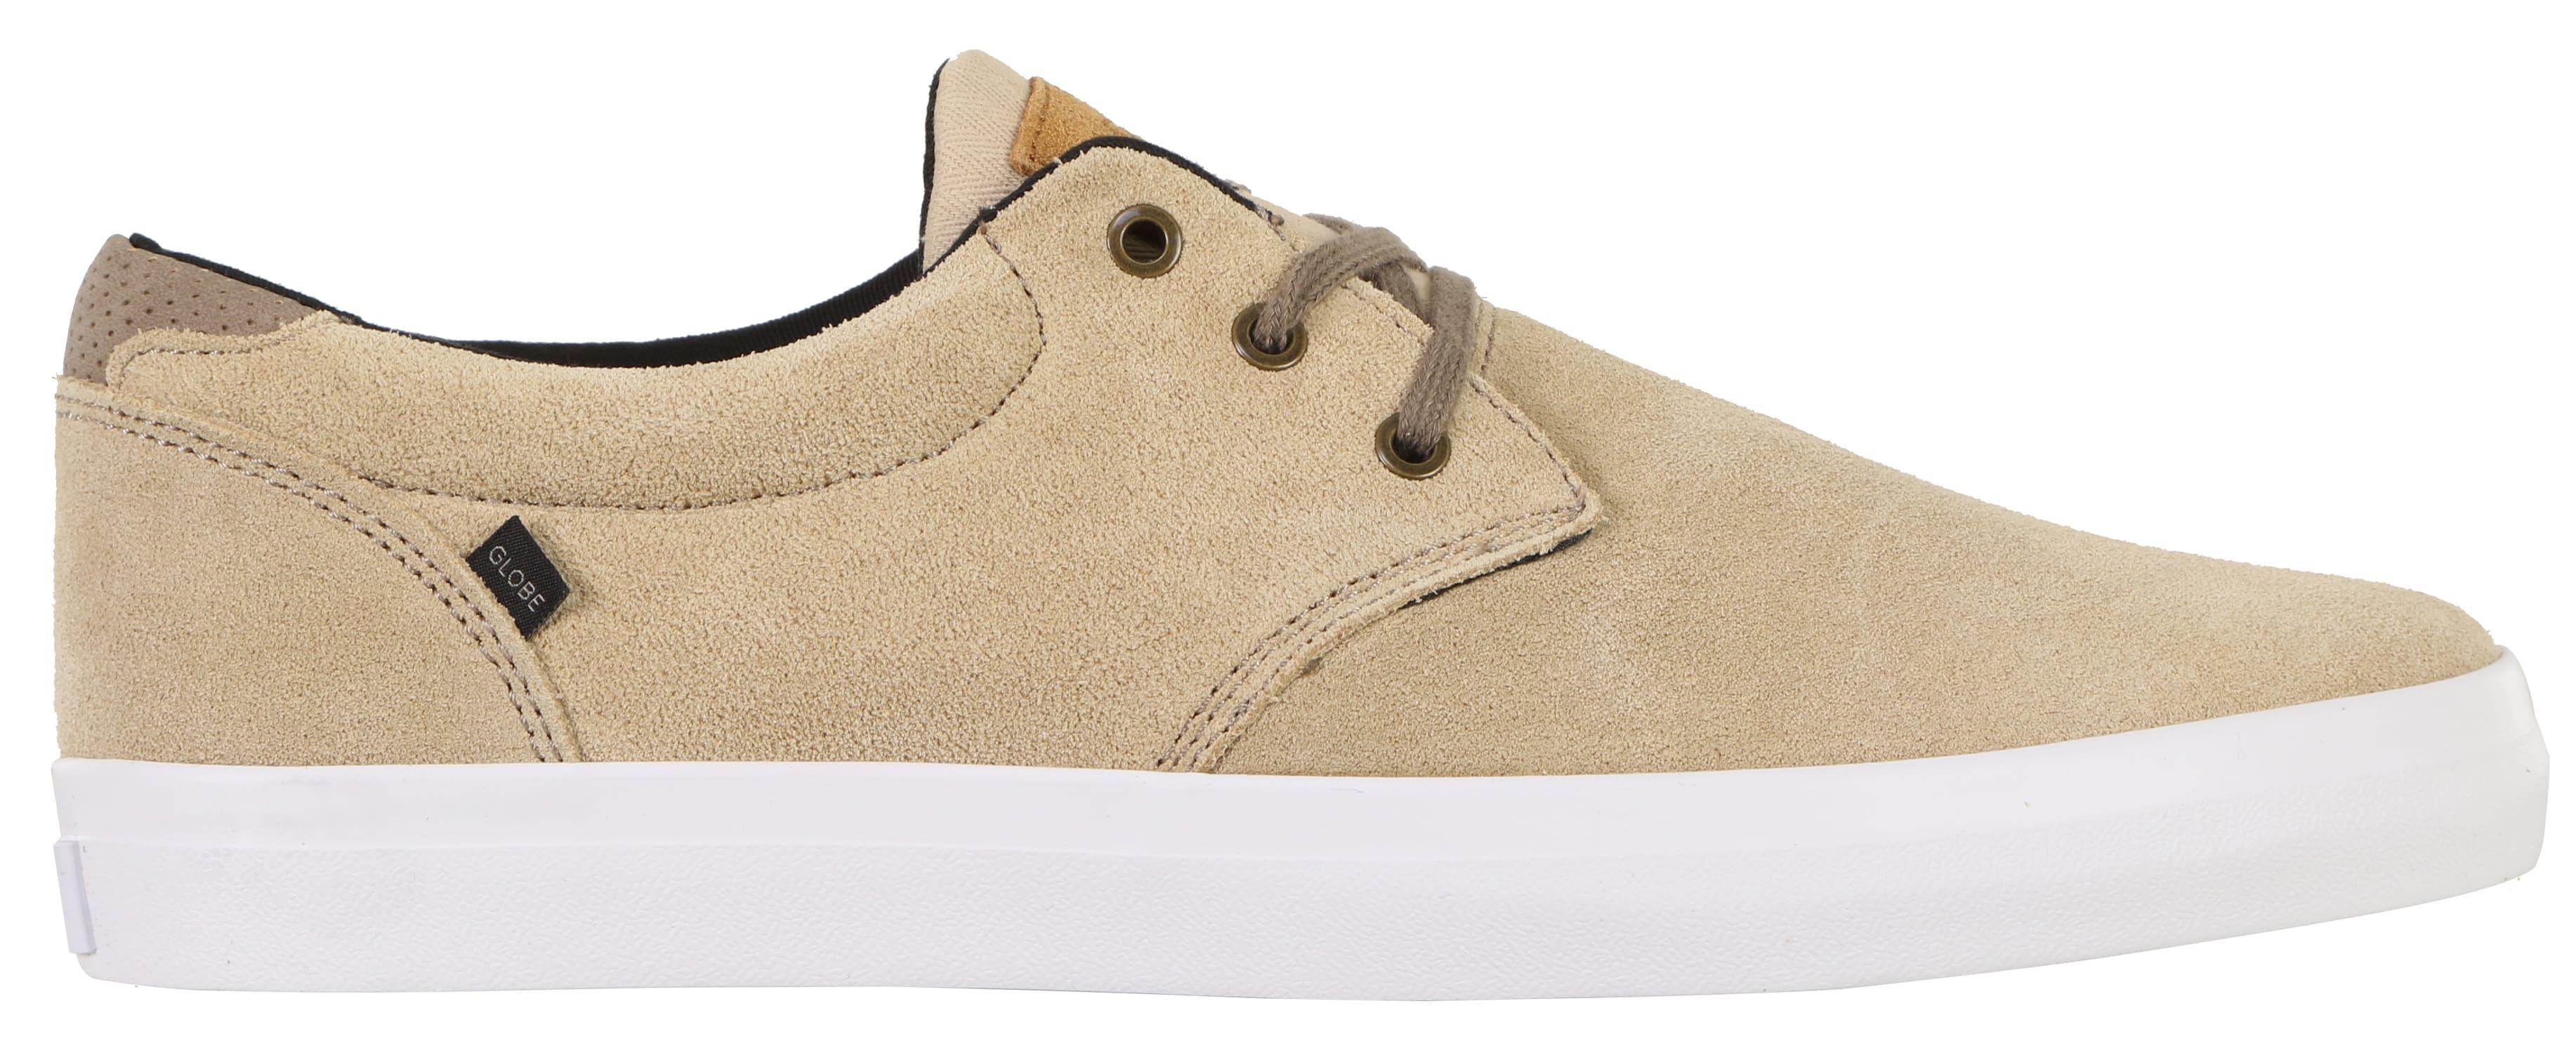 Discount Skate Shoes Cheap Discount Skate Shoes